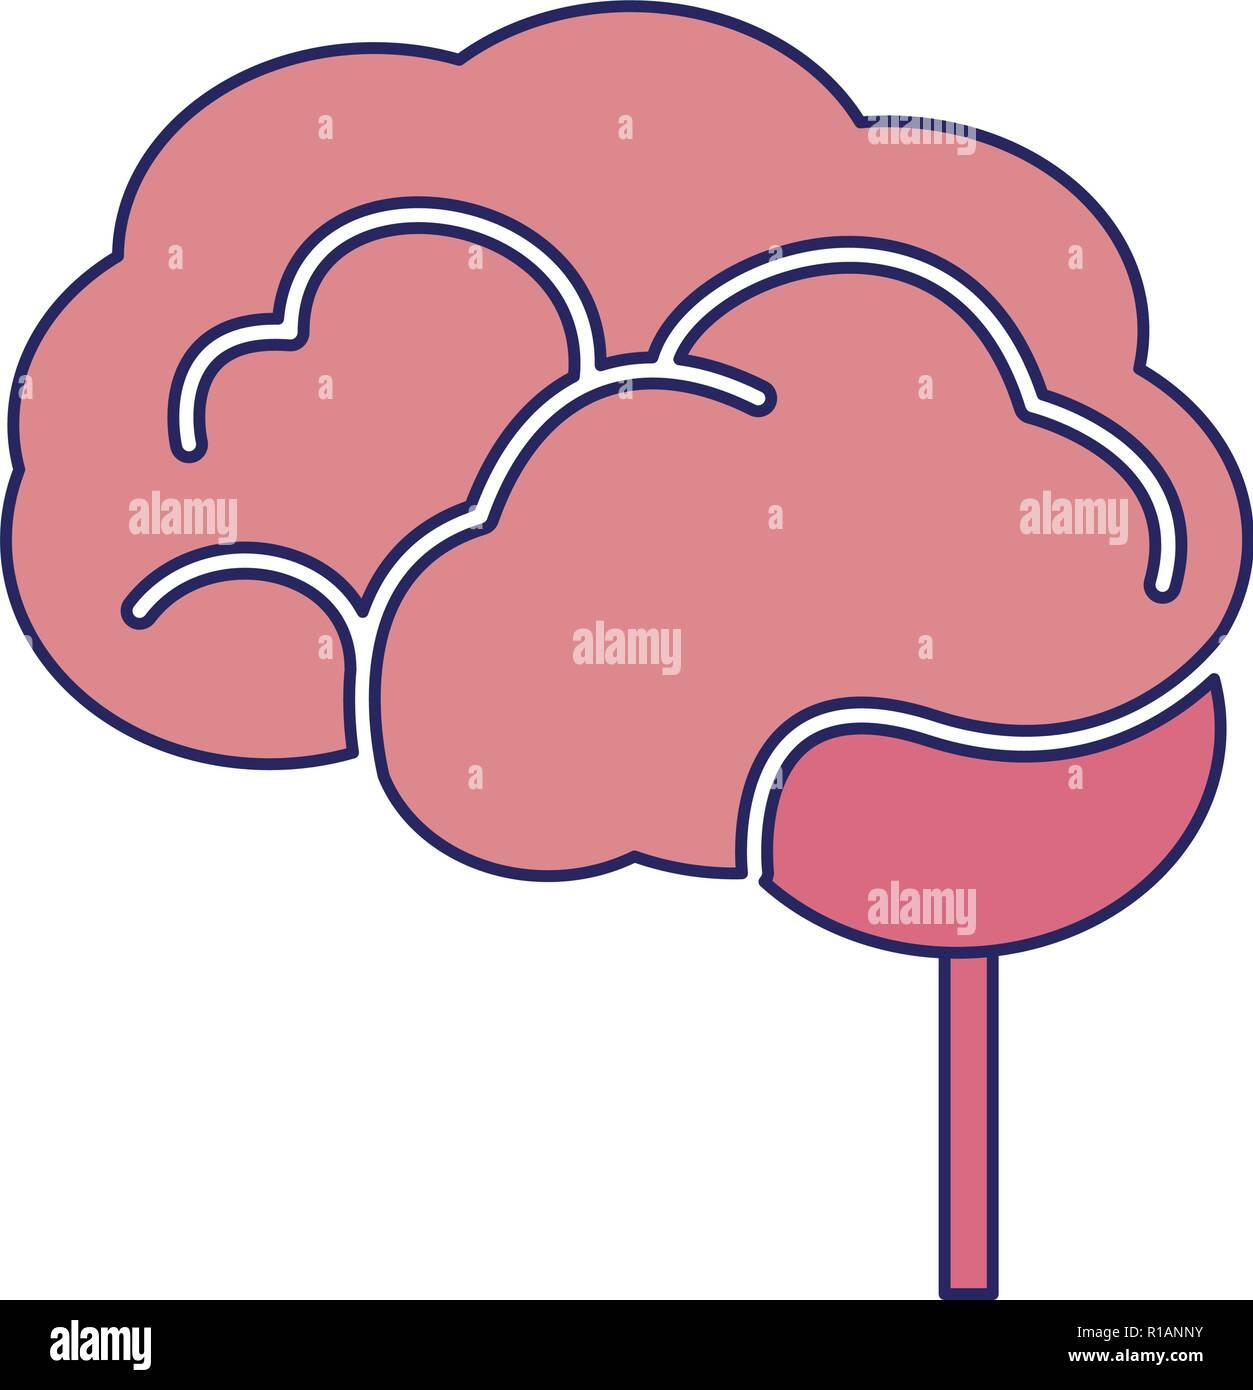 Human brain simple symbol vector illustration graphic design